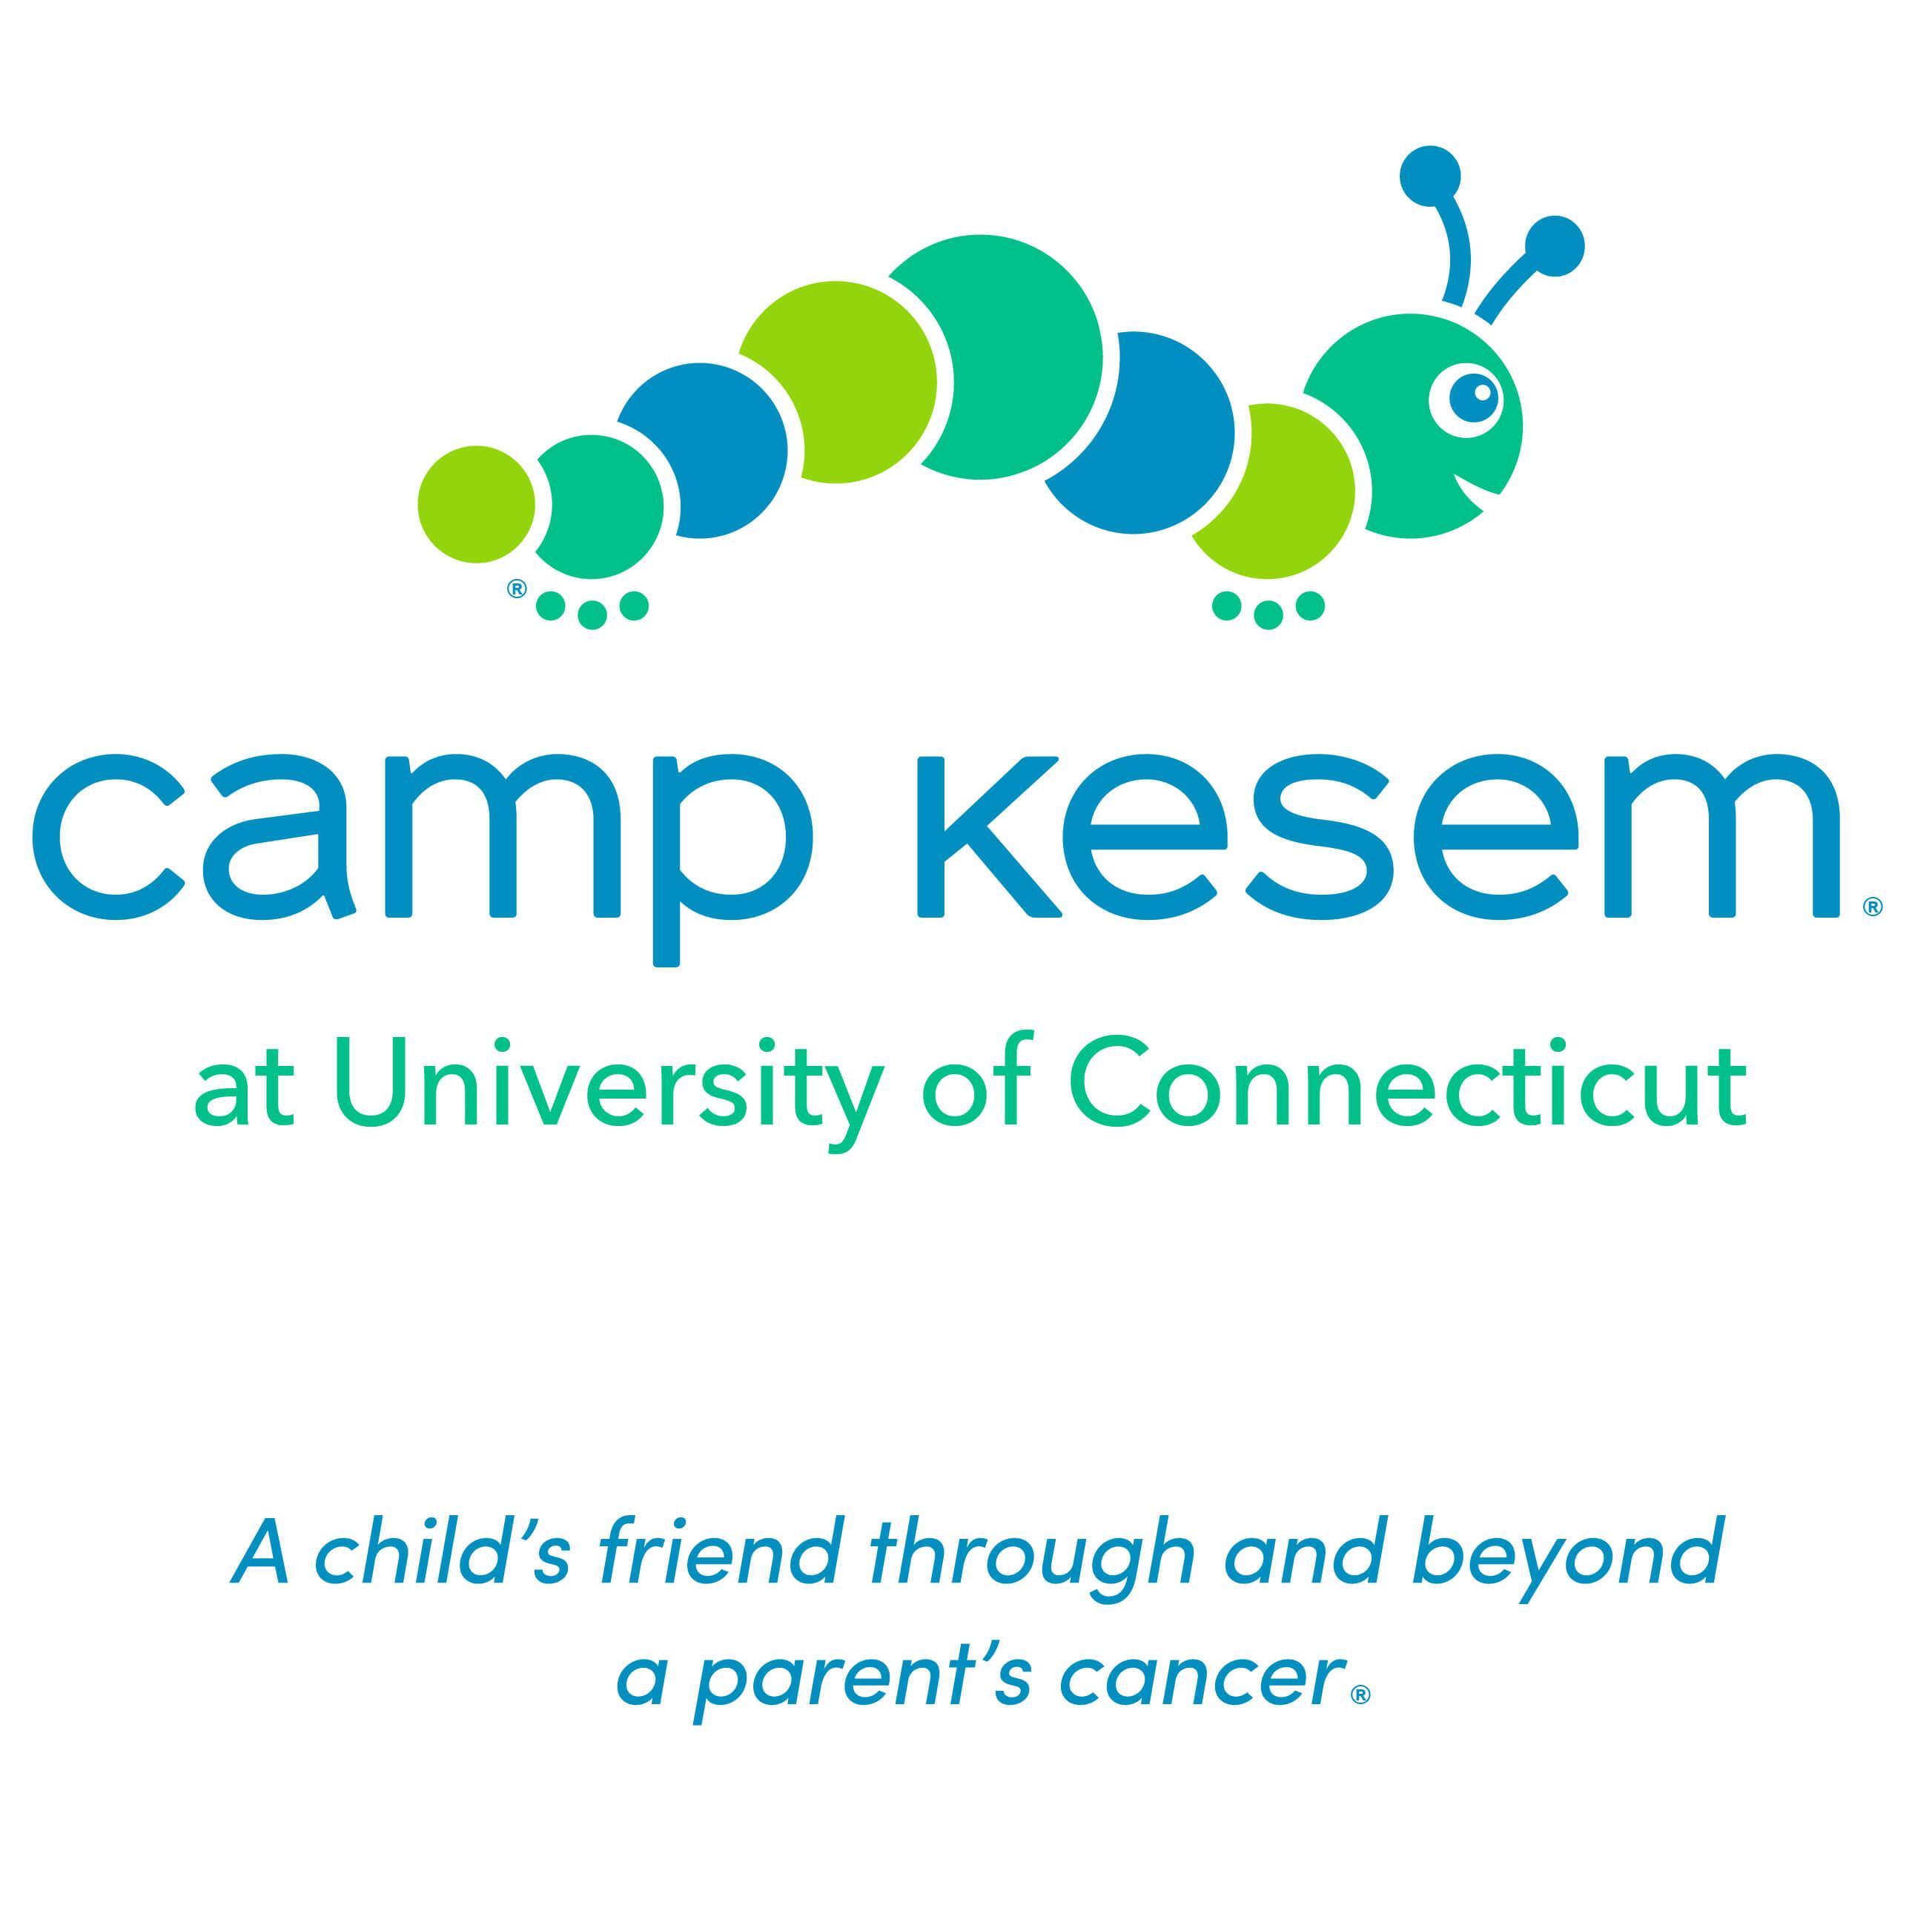 Camp Kesem at University of Connecticut